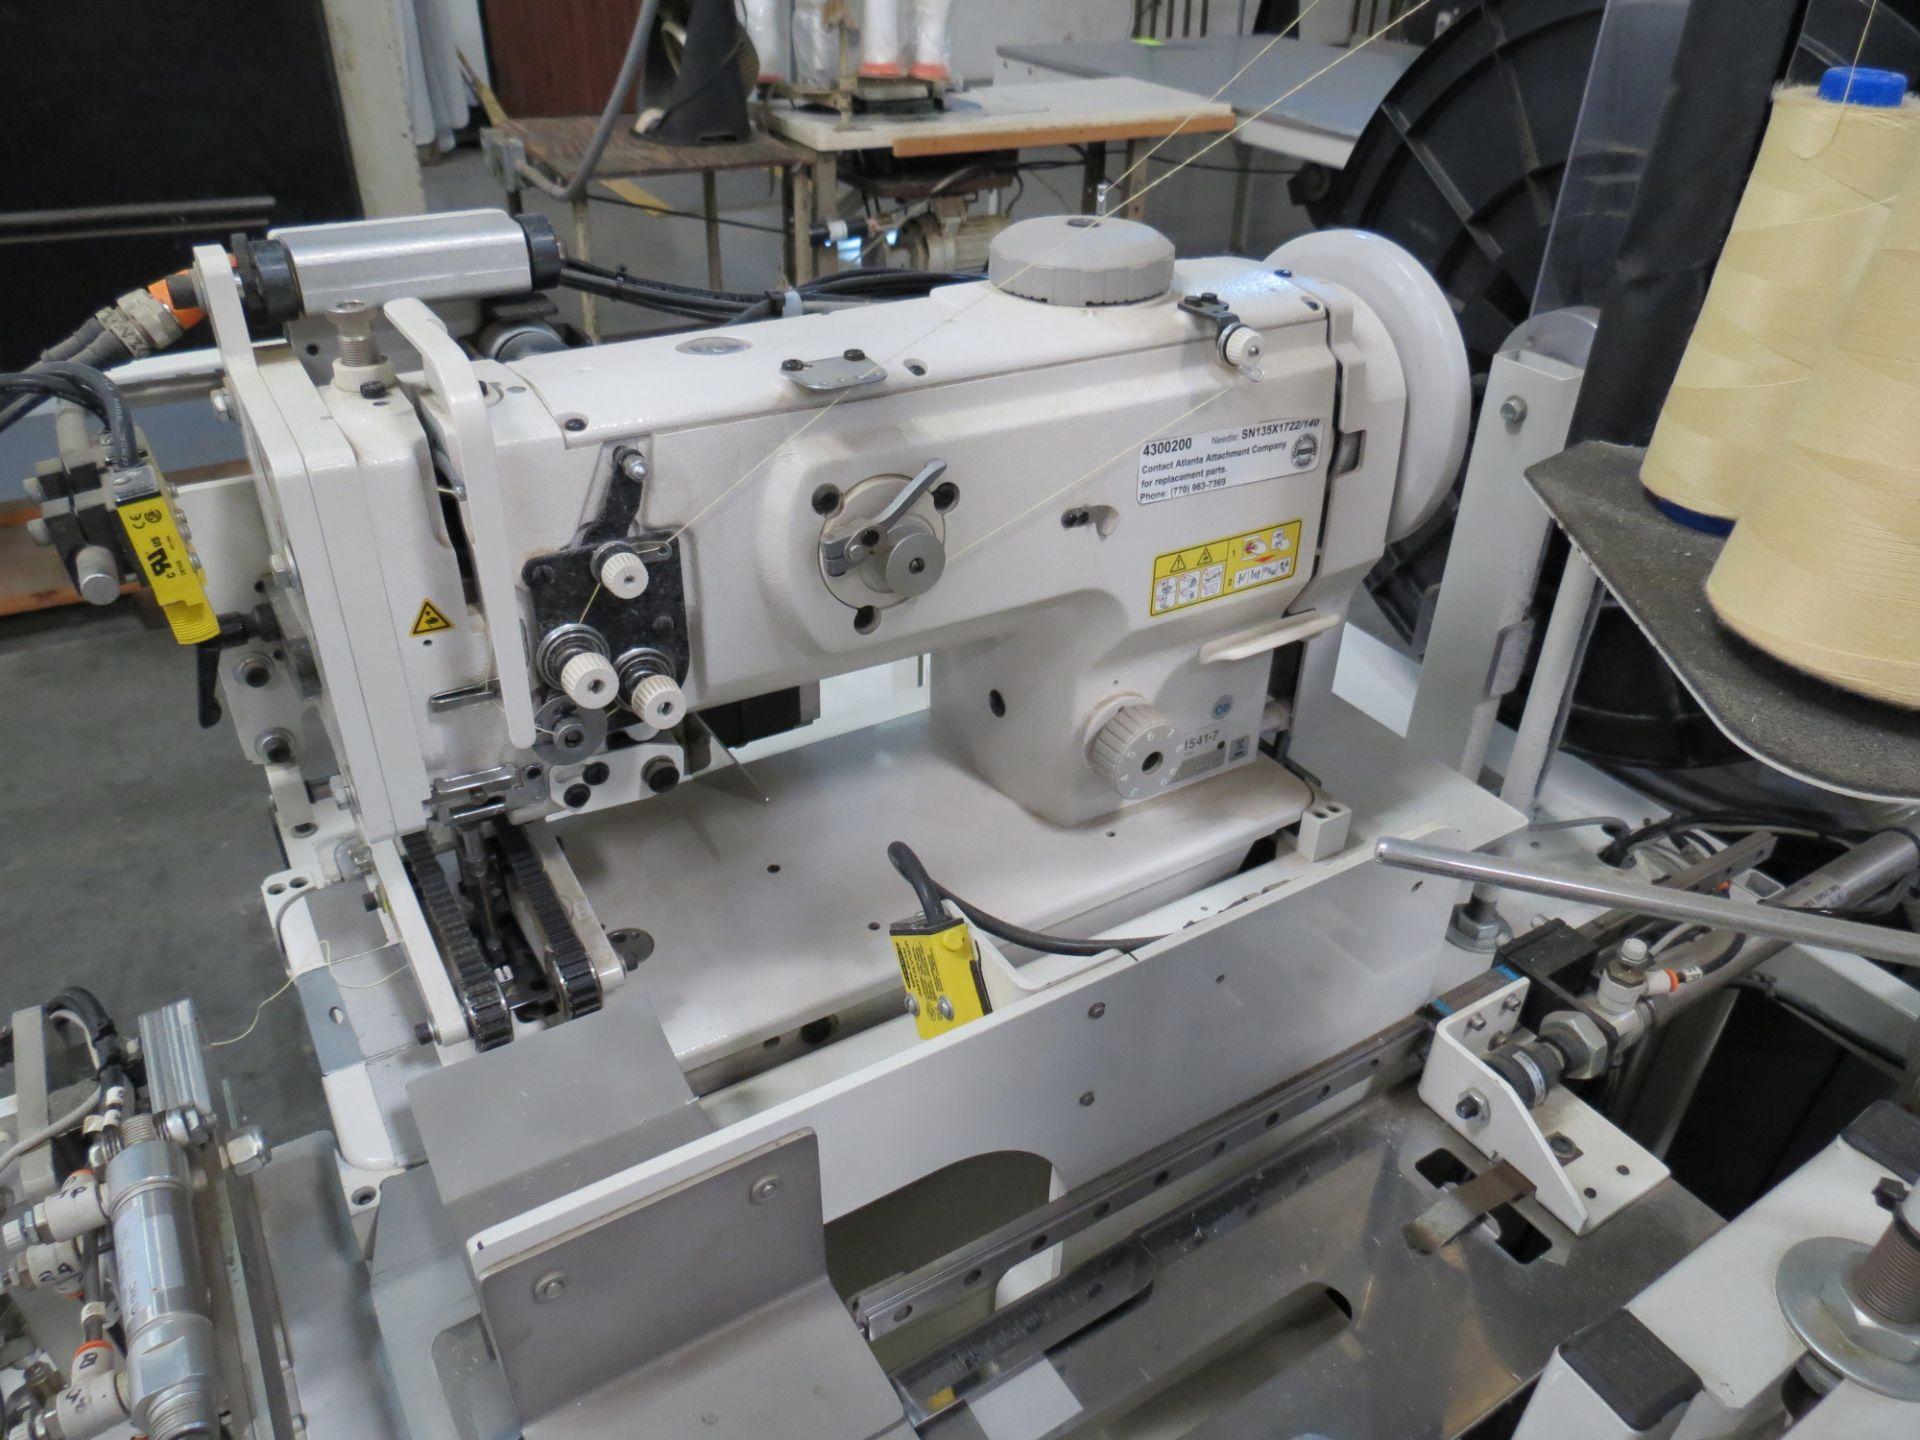 Atlanta Attachment Company, 4300BBorder/Attach Handles Sewing Machine, 220V, SN:209227071609, Juki - Image 6 of 11